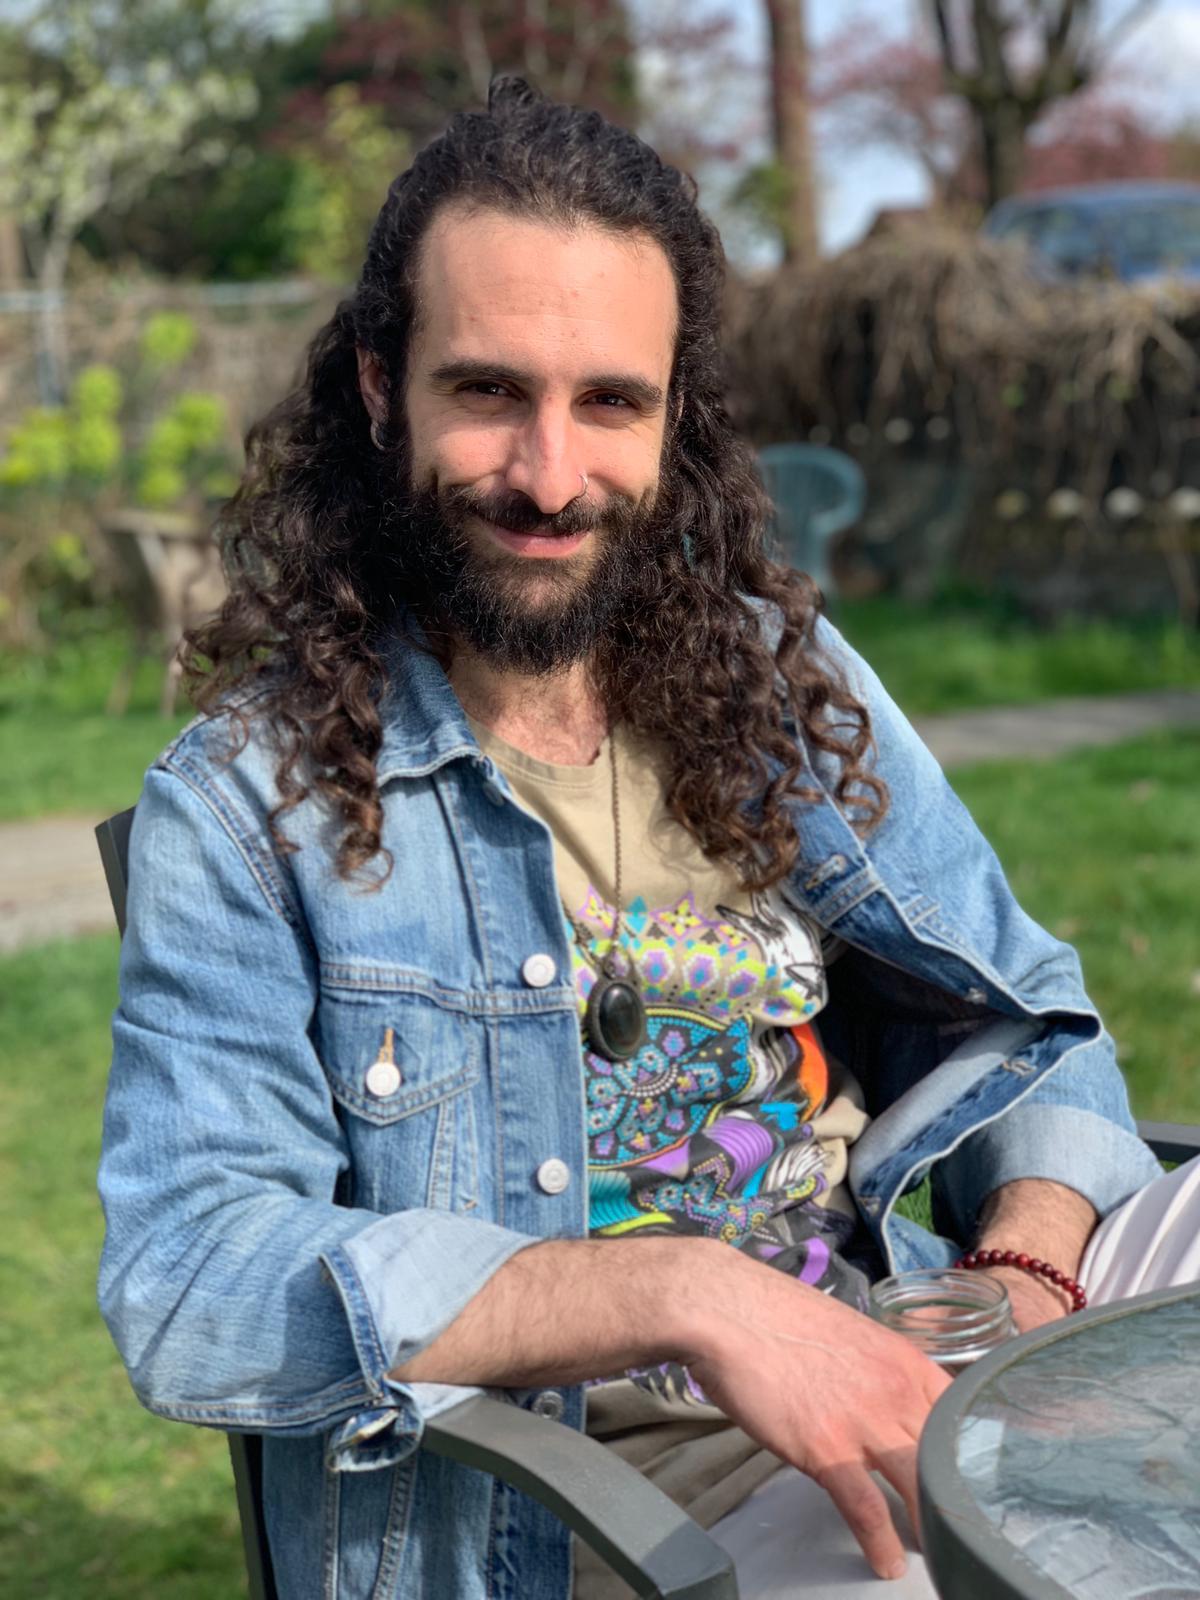 Fabian Frangipane: B.Sc Psychology & Philosophy, Dip. Counselling., Certified Yoga Teacher